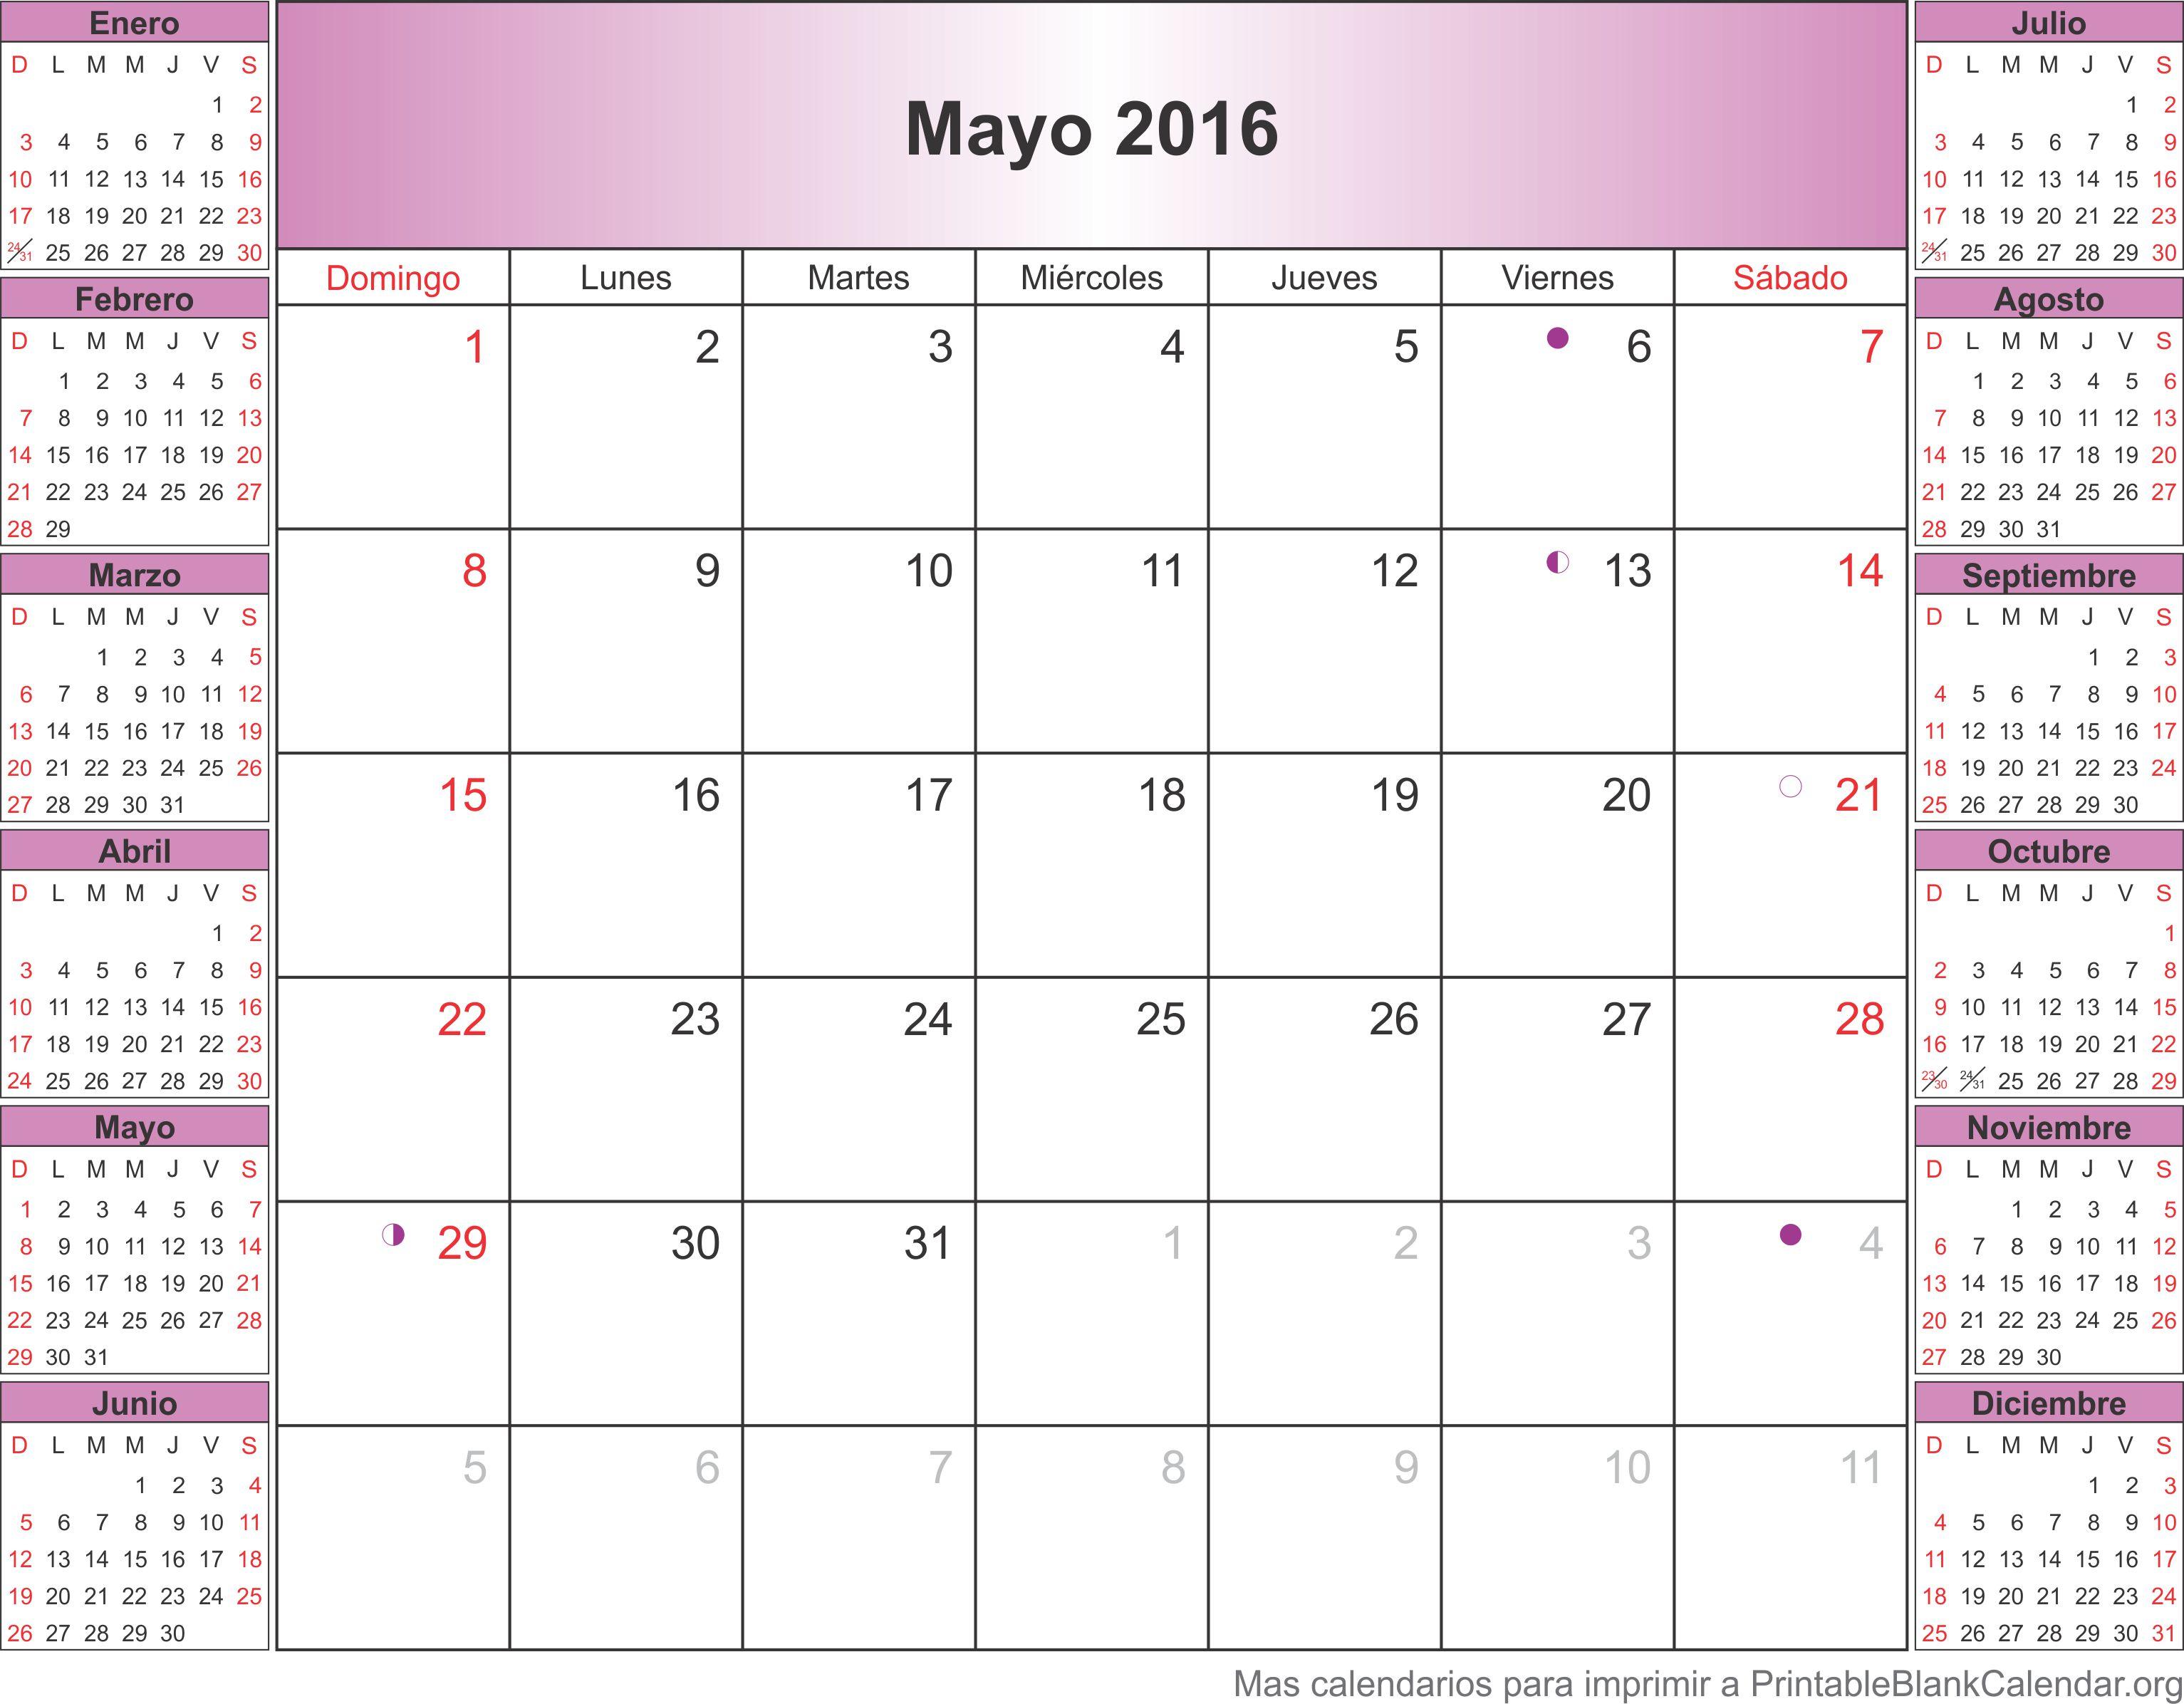 Calendario Mayo 2016